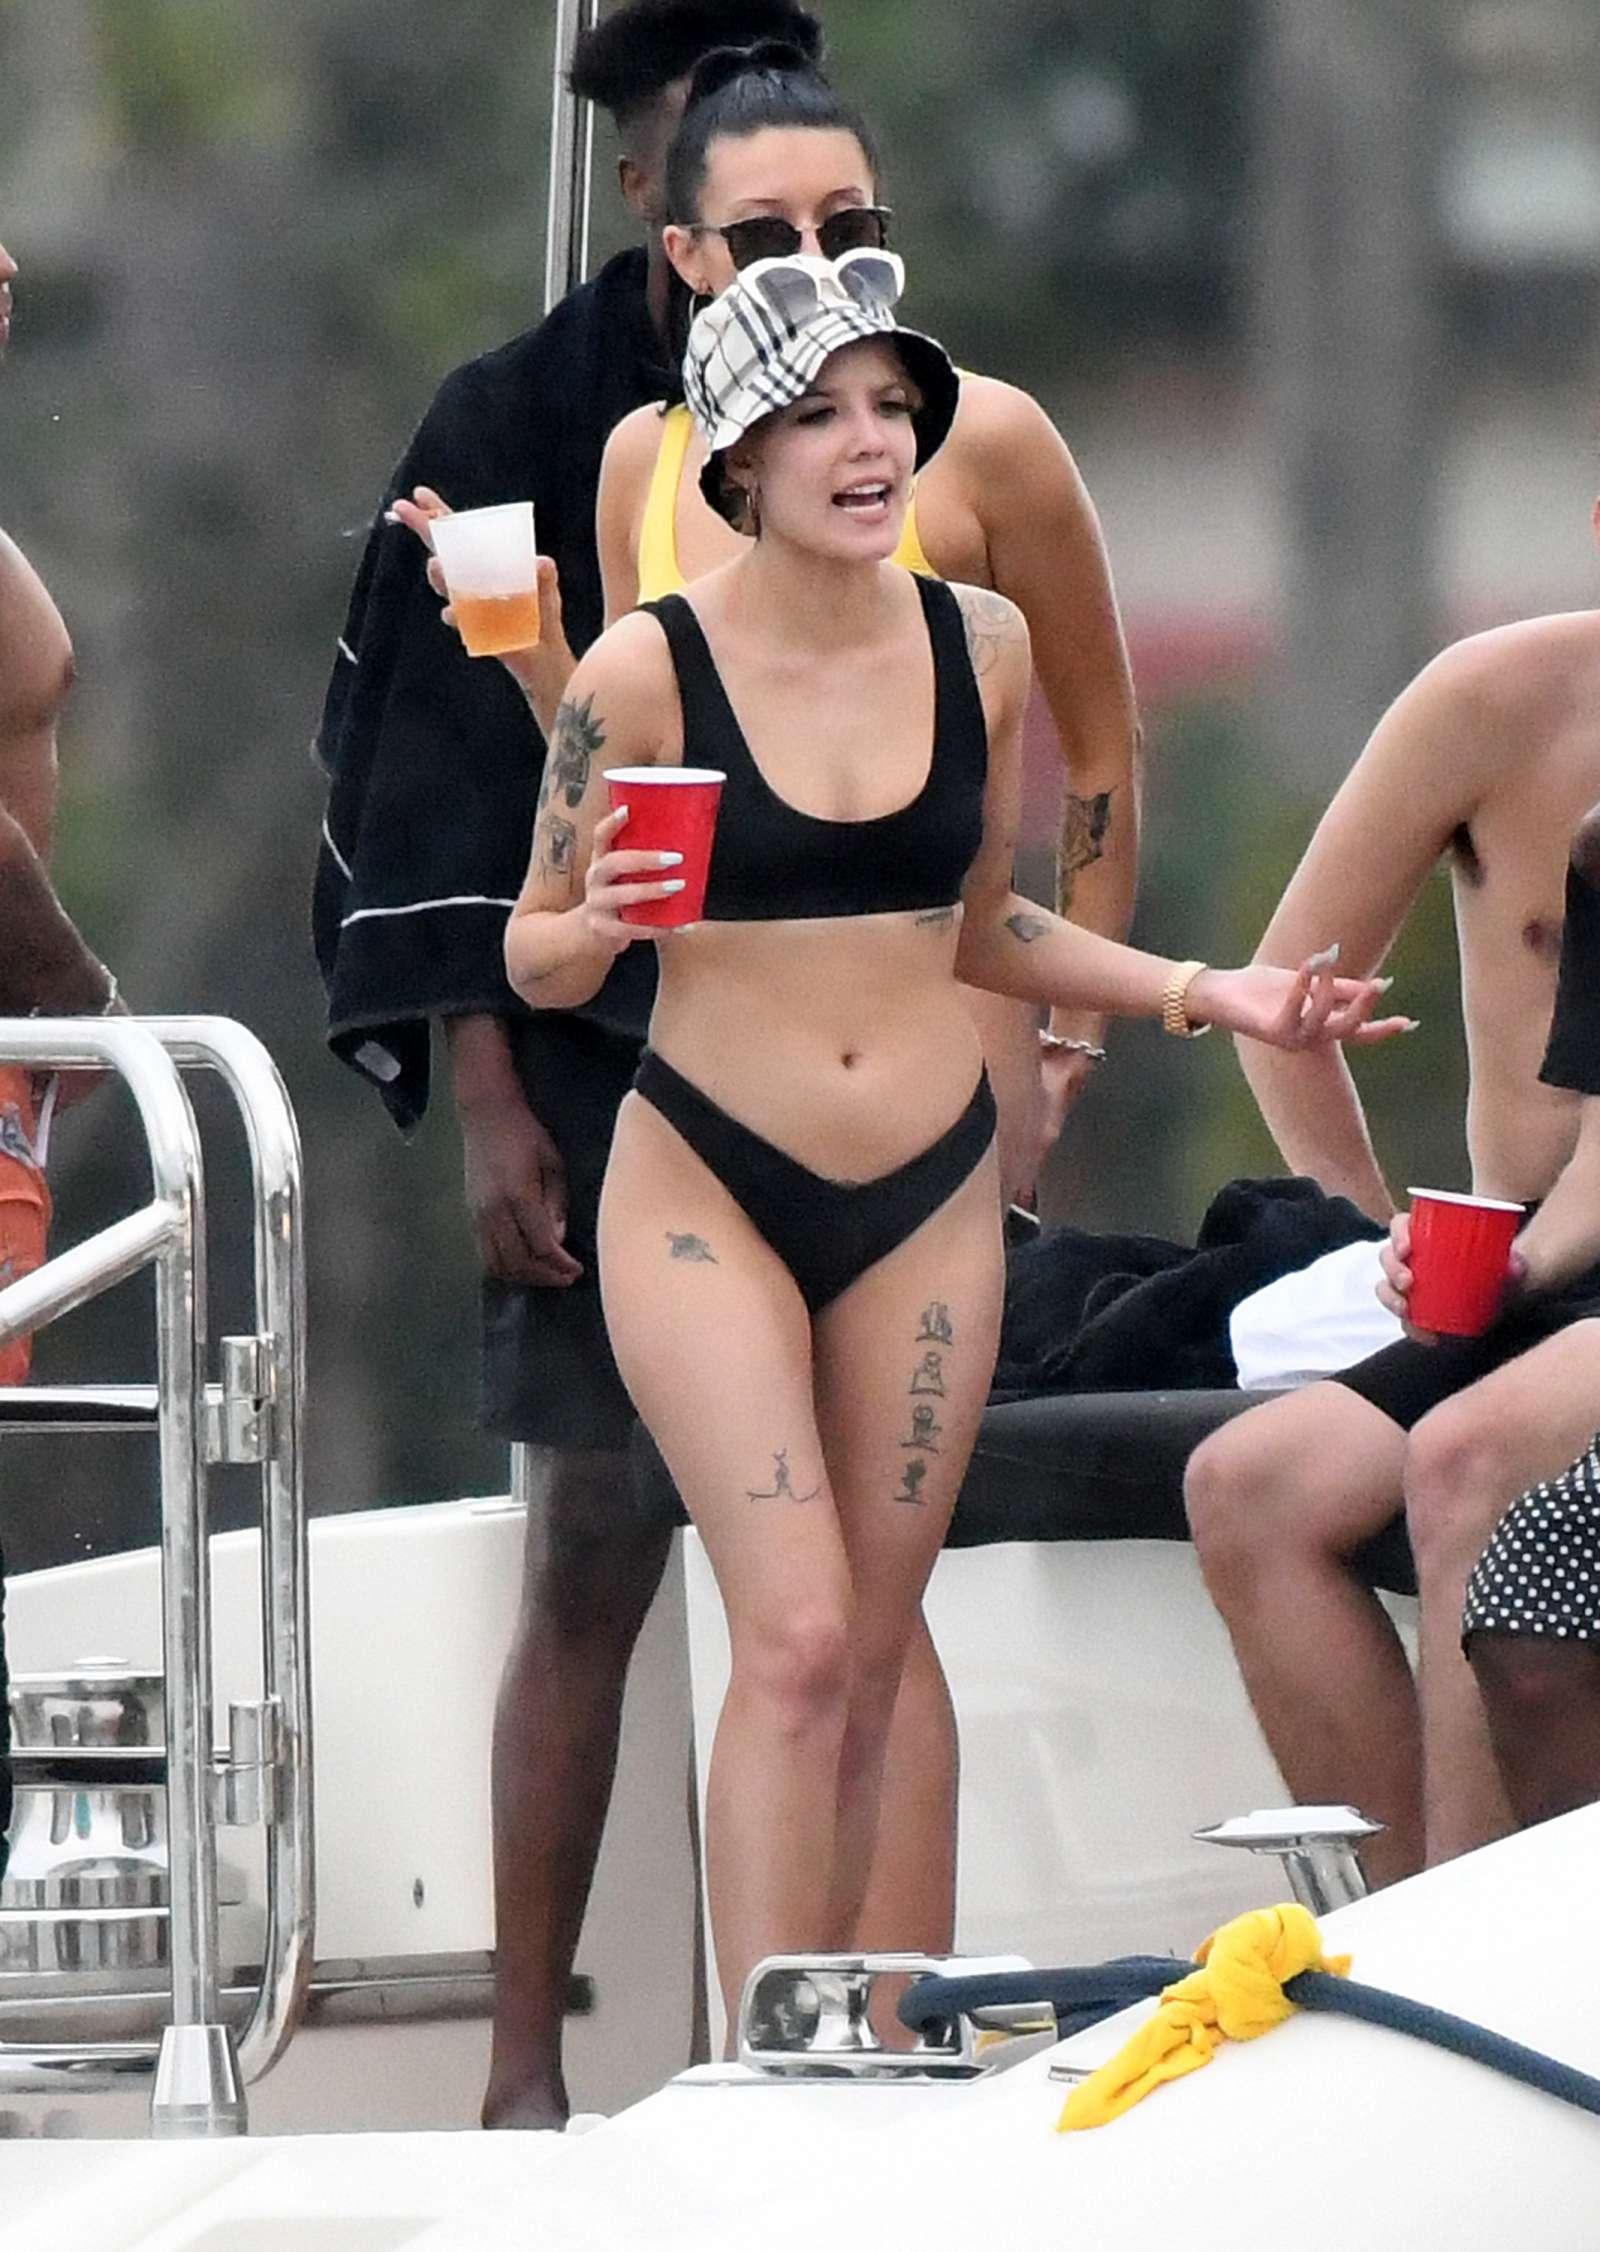 Bikini Halsey nudes (88 photo), Sexy, Cleavage, Feet, butt 2015